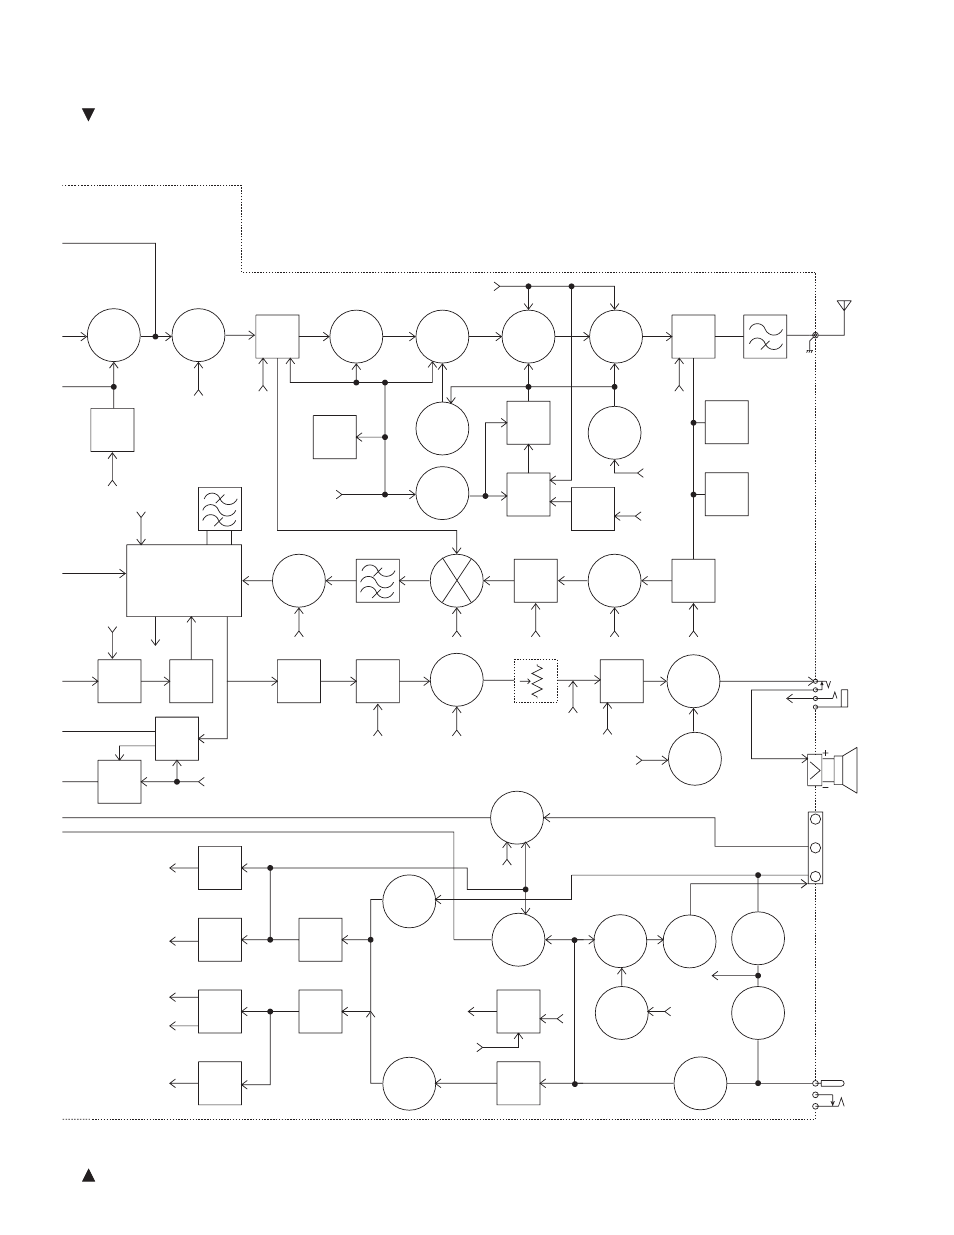 hight resolution of th k2at k2e k2et block diagram kenwood 144mhz fm transceiver k2e user manual page 60 63